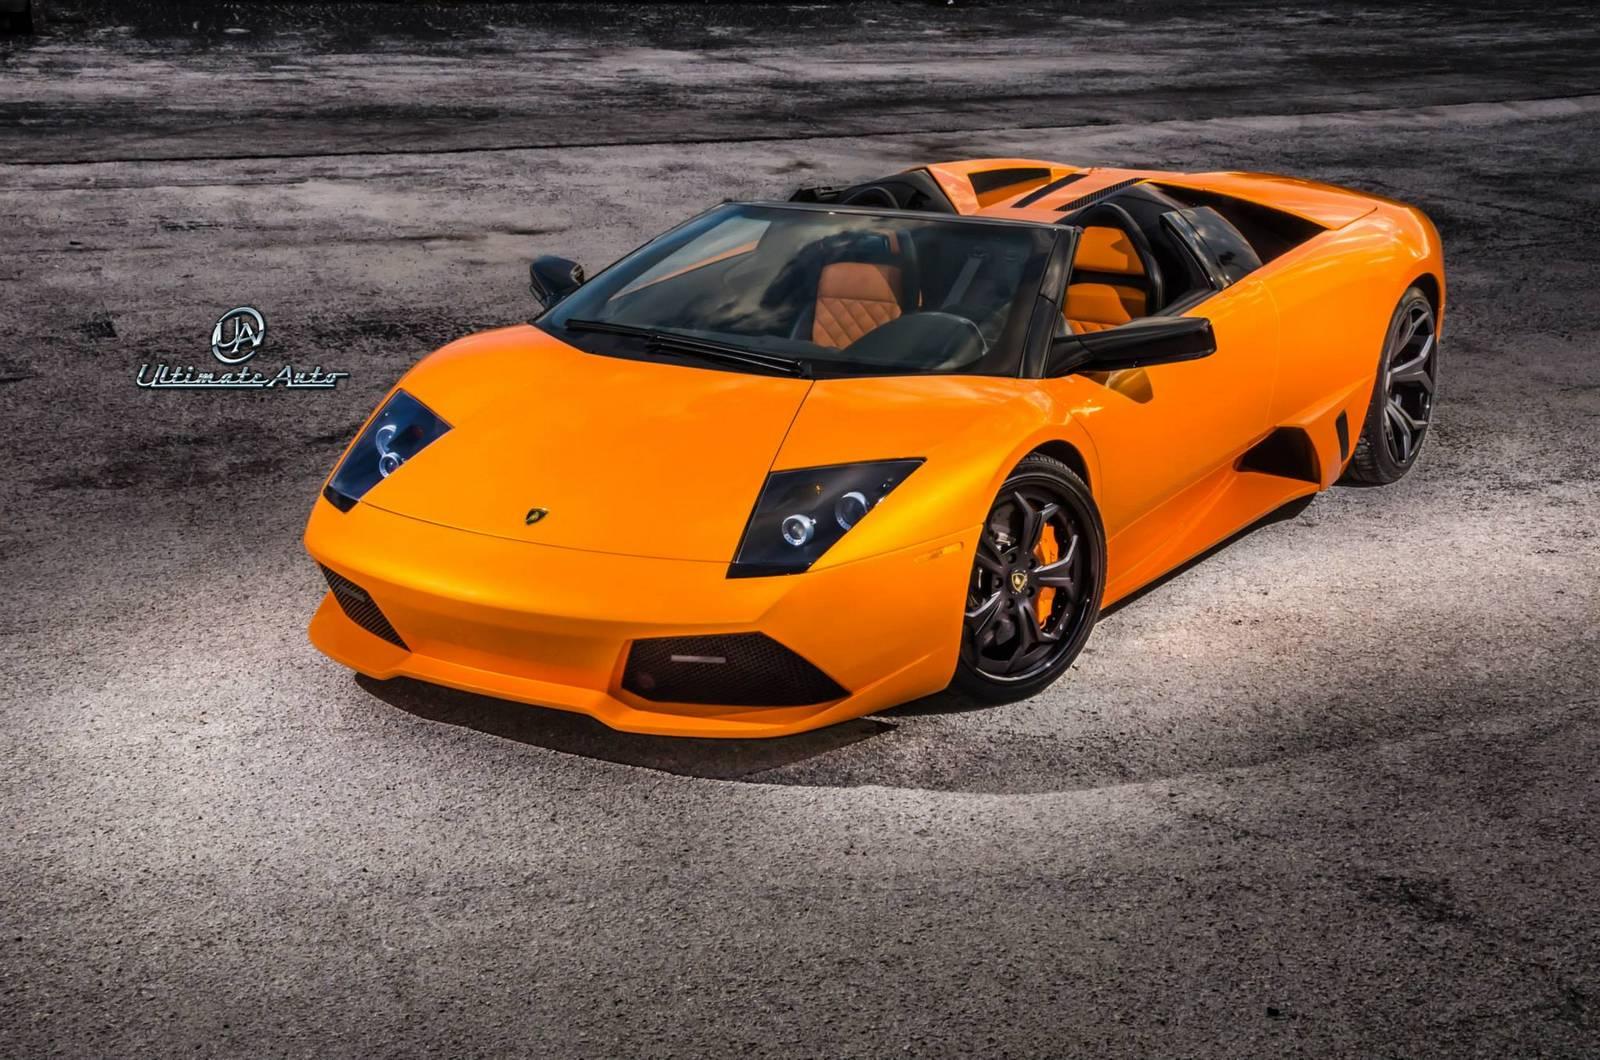 High Quality Lamborghini Murcielago LP640 Roadster By Ultimate Auto